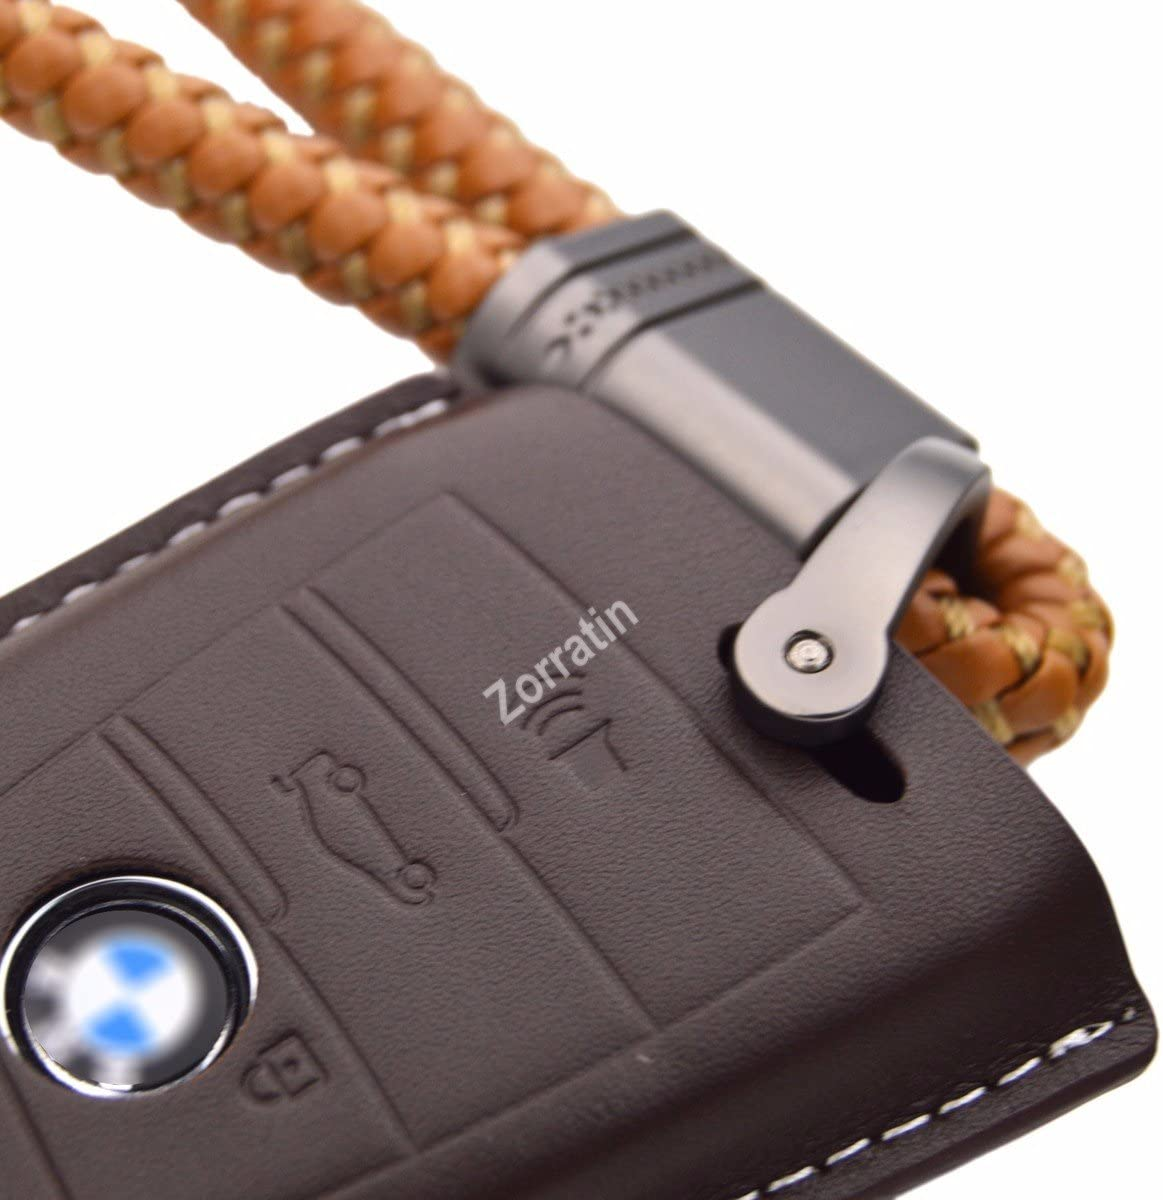 Real Leather Smart Key Case Cover Trim w// Key Chain fit BMW key fob X5 X6 F15 F16 2015 2016 2017 2018